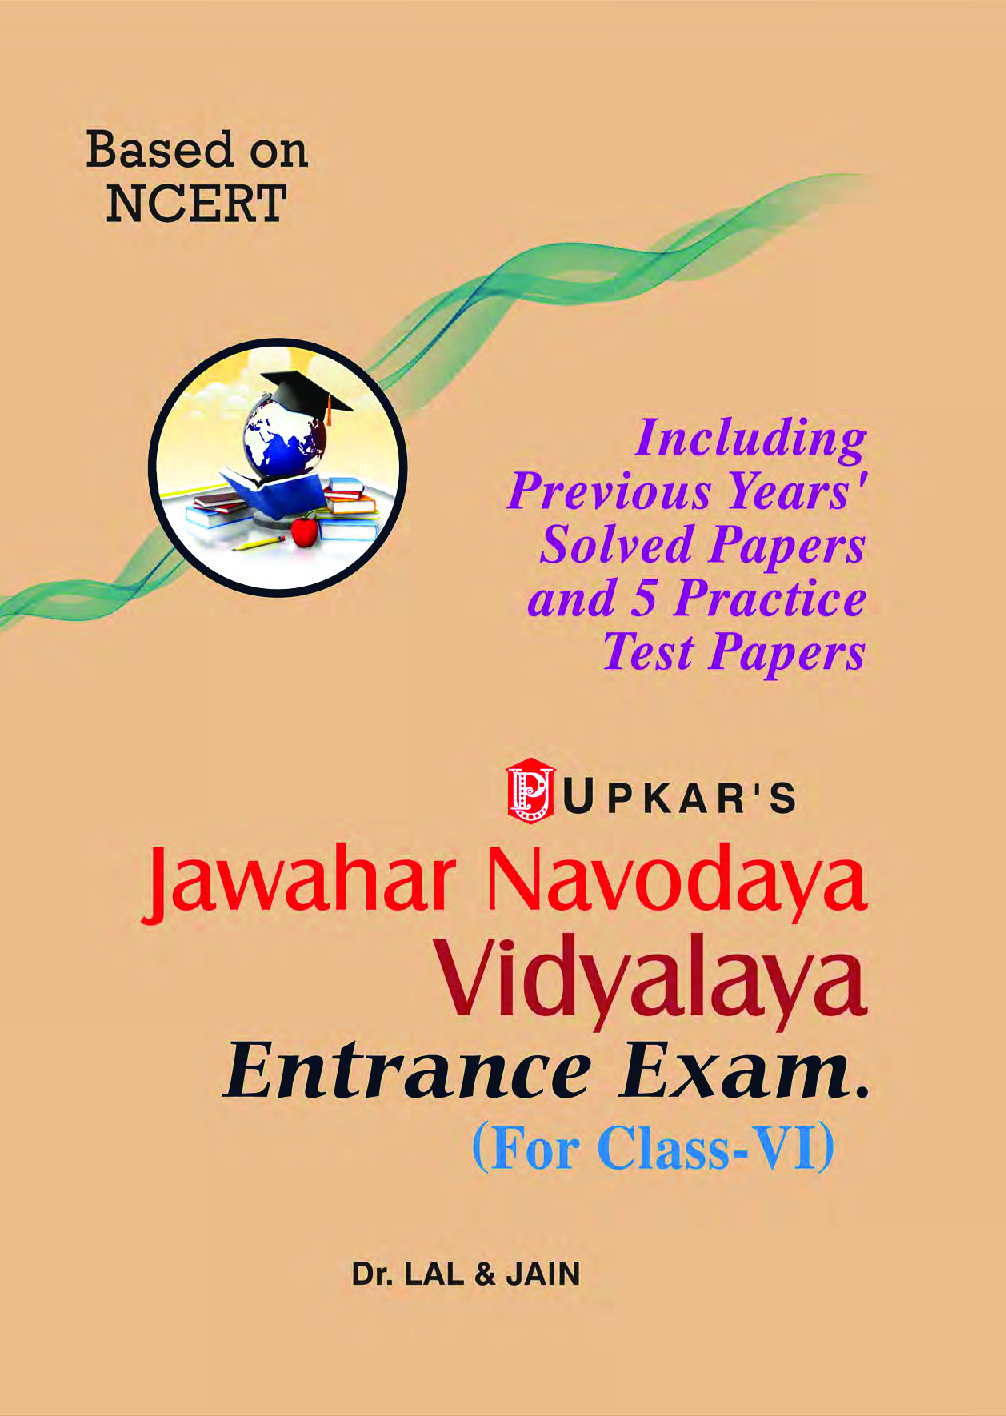 Navodaya Vidyalaya Entrance Exam For Class - VI - Page 1